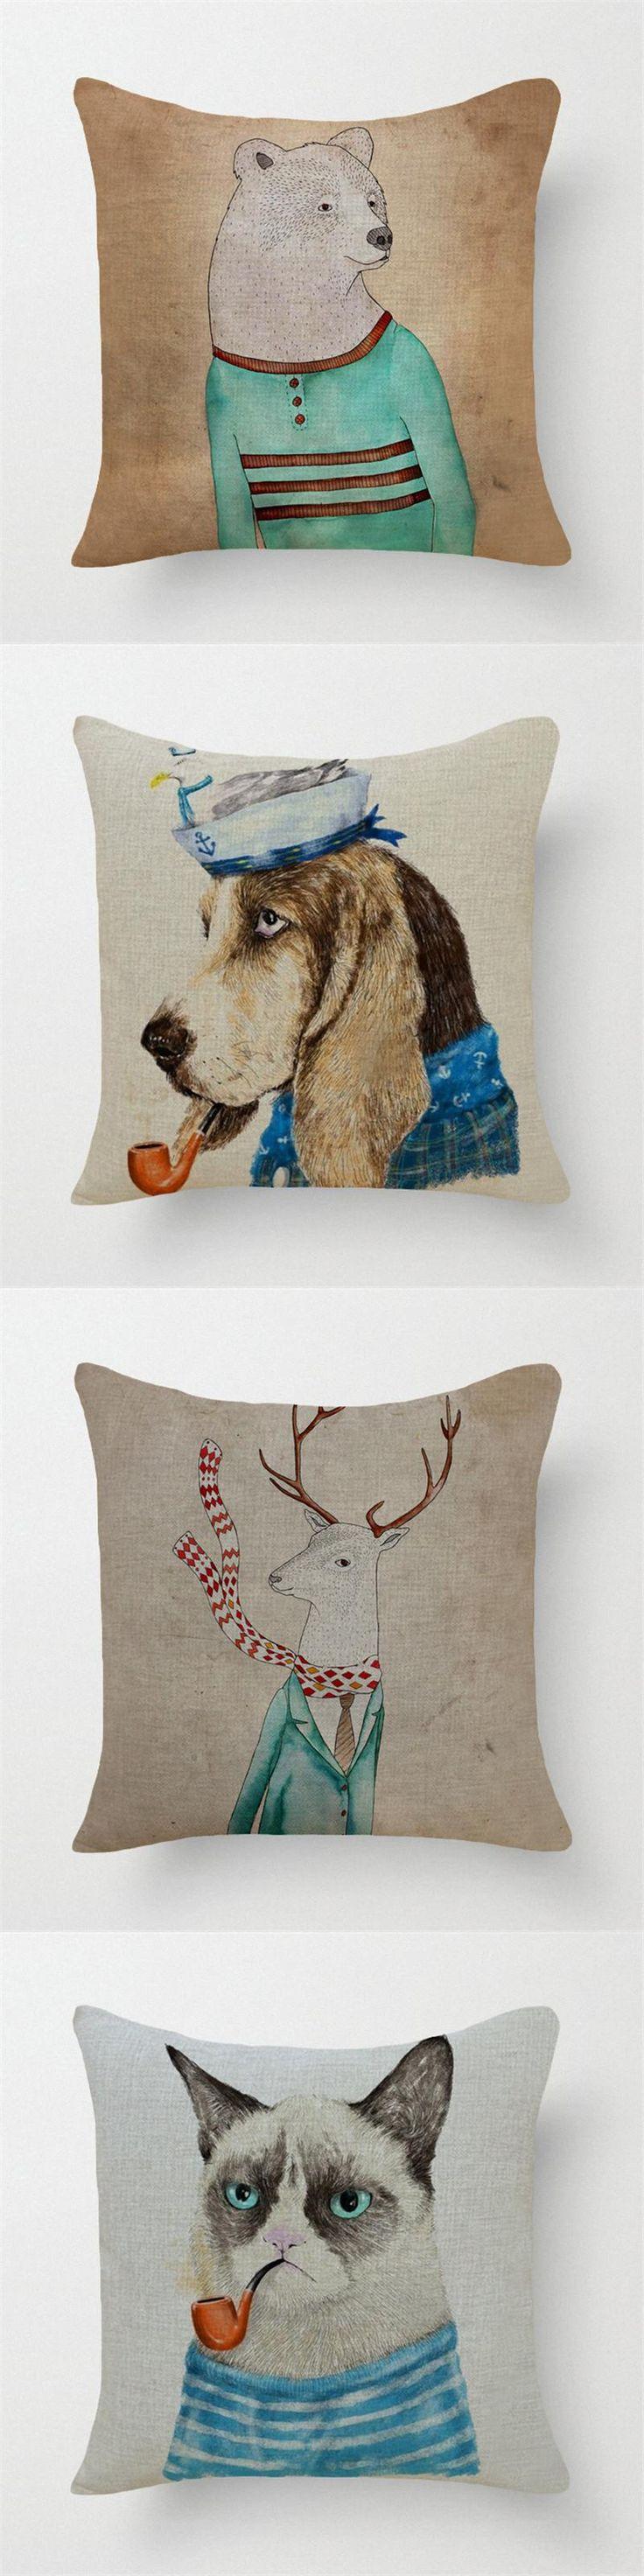 Cute Cartoon Animals Print home ornament pillow Case cushion cover 1pcs promotion 45*45cm scandinavian style